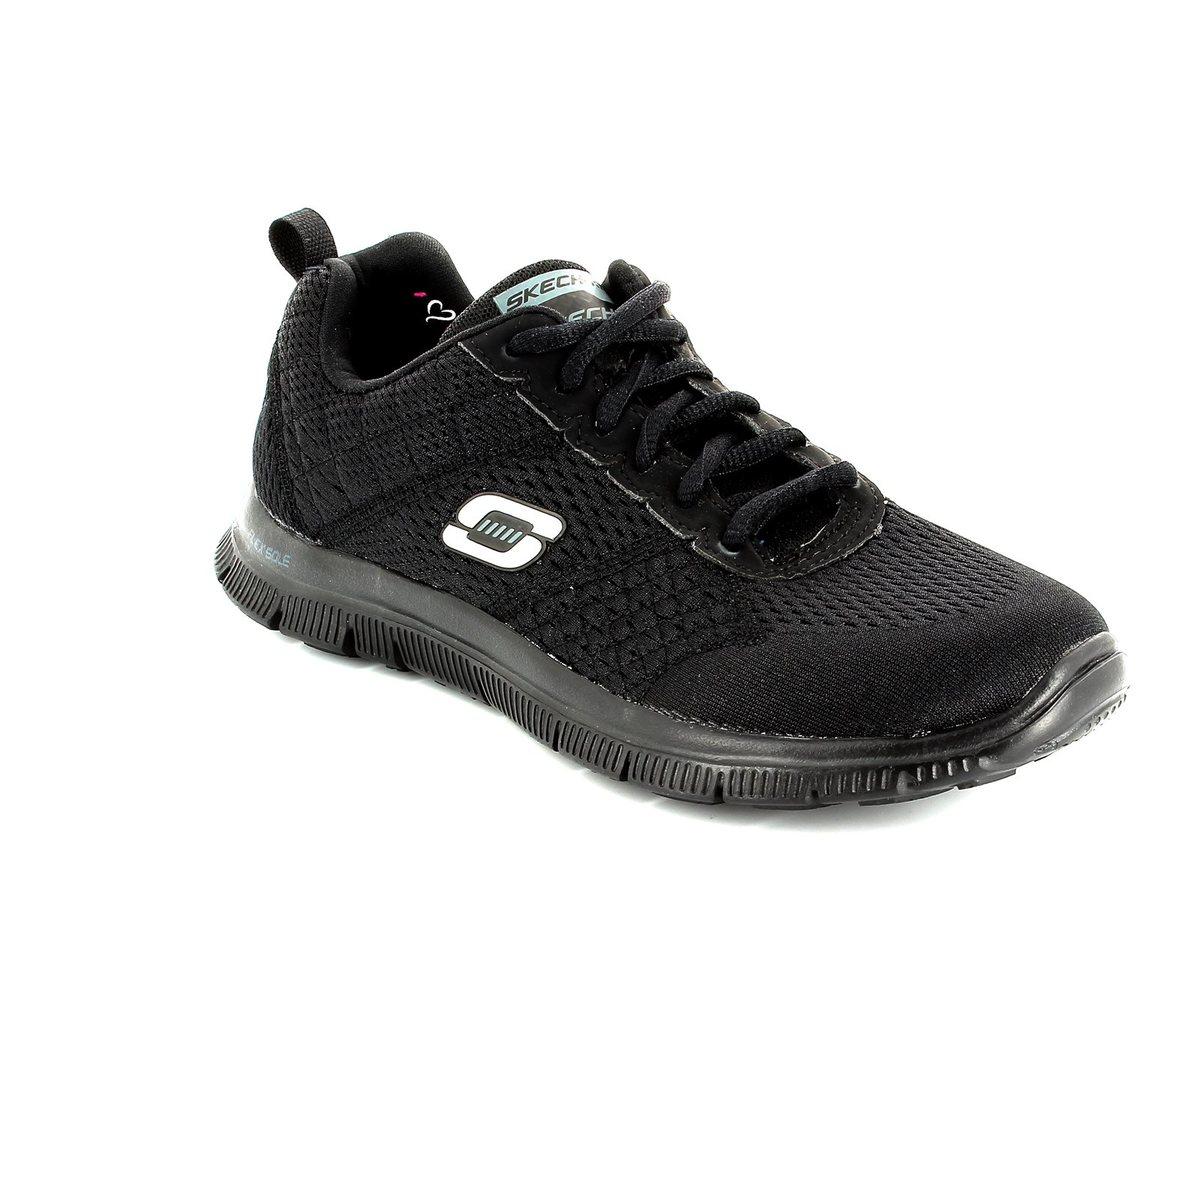 cda581caa225 Skechers Obvious Choice 12058 BBK Black trainers